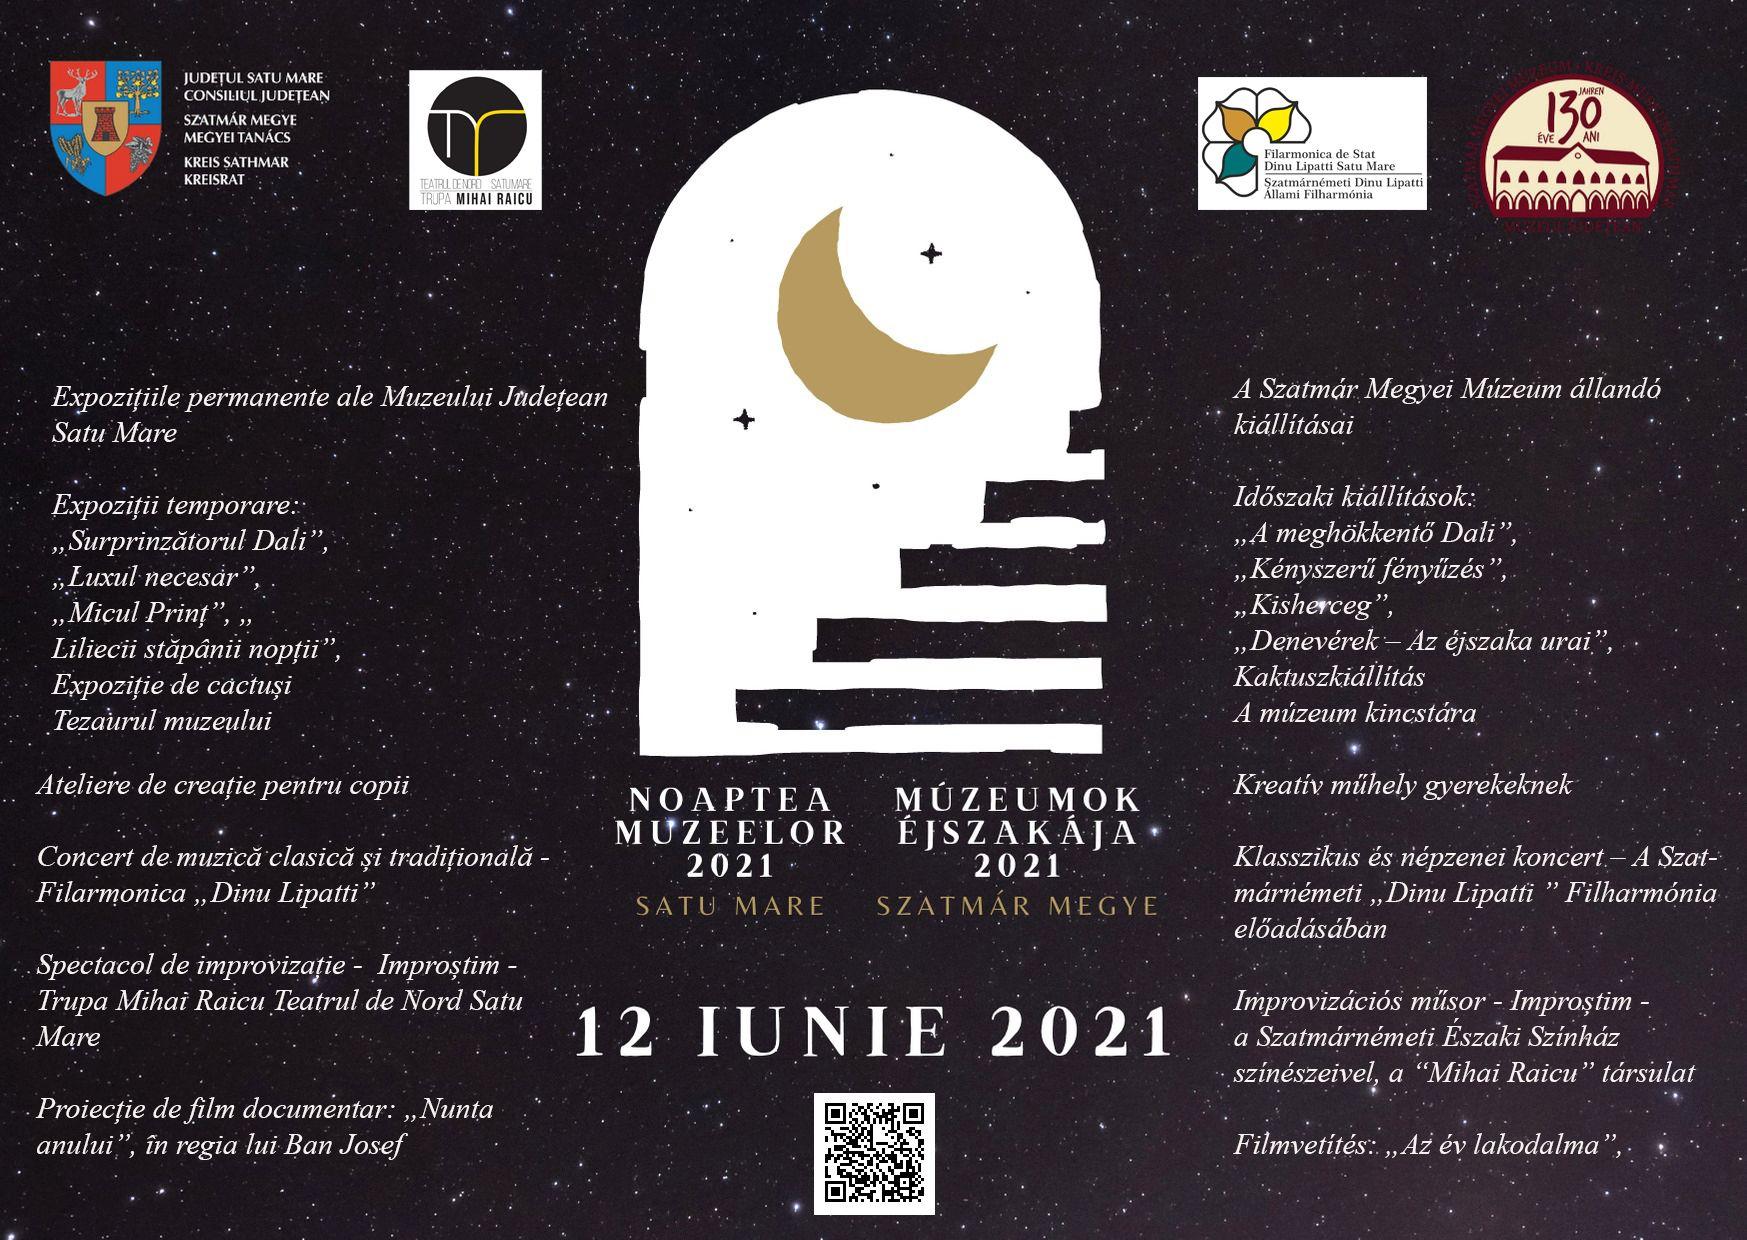 hirek/2021/junius/12/afis-noaptea-muzeelor.jpg